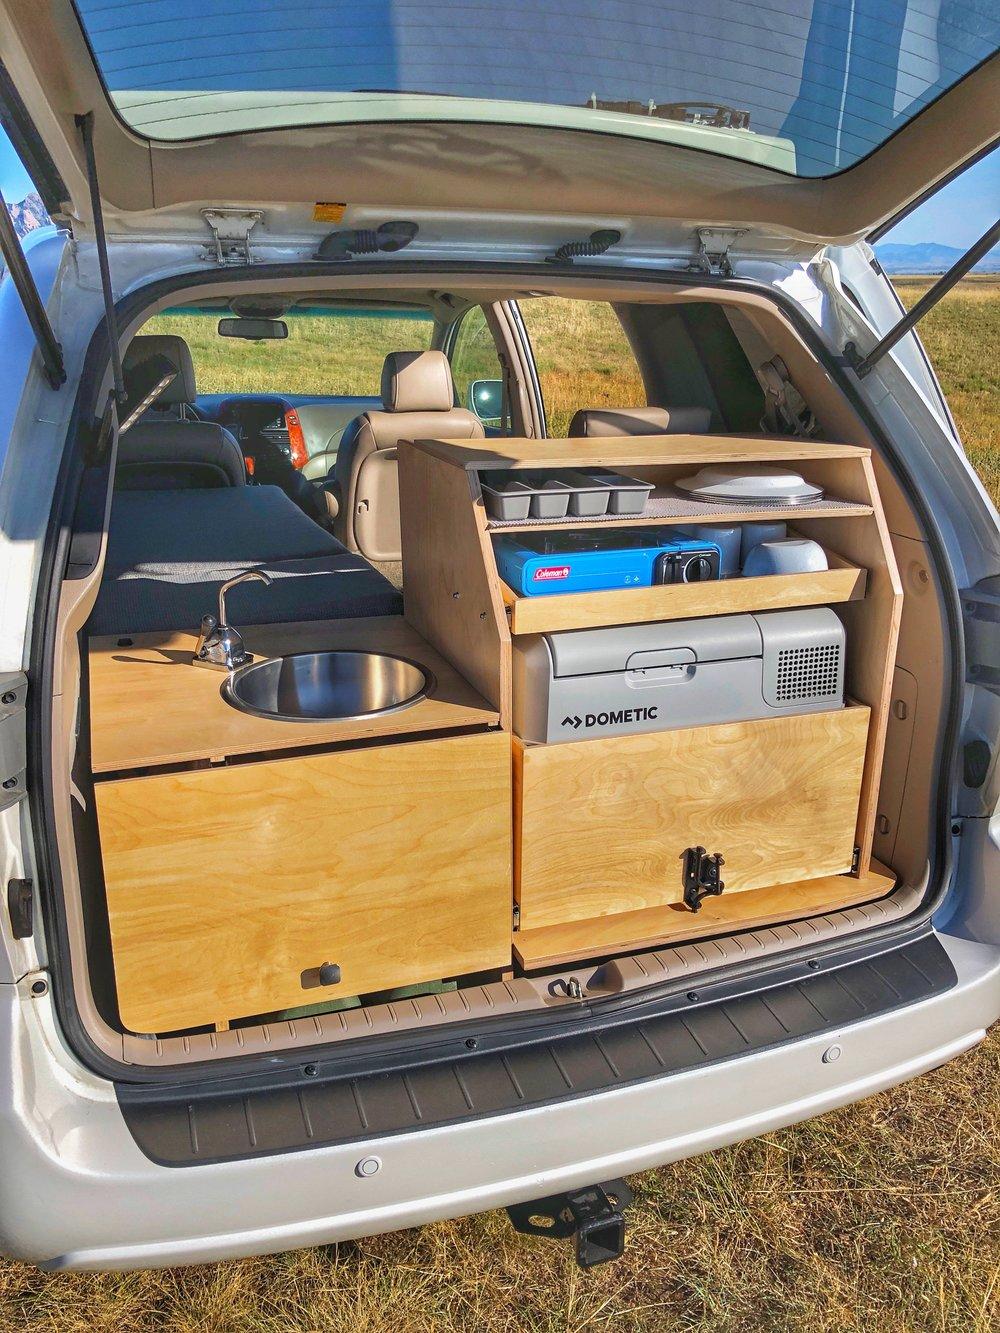 Toyota Sienna Camper Conversion Contravans Car Camping Systems In 2020 Minivan Camper Conversion Mini Van Toyota Sienna